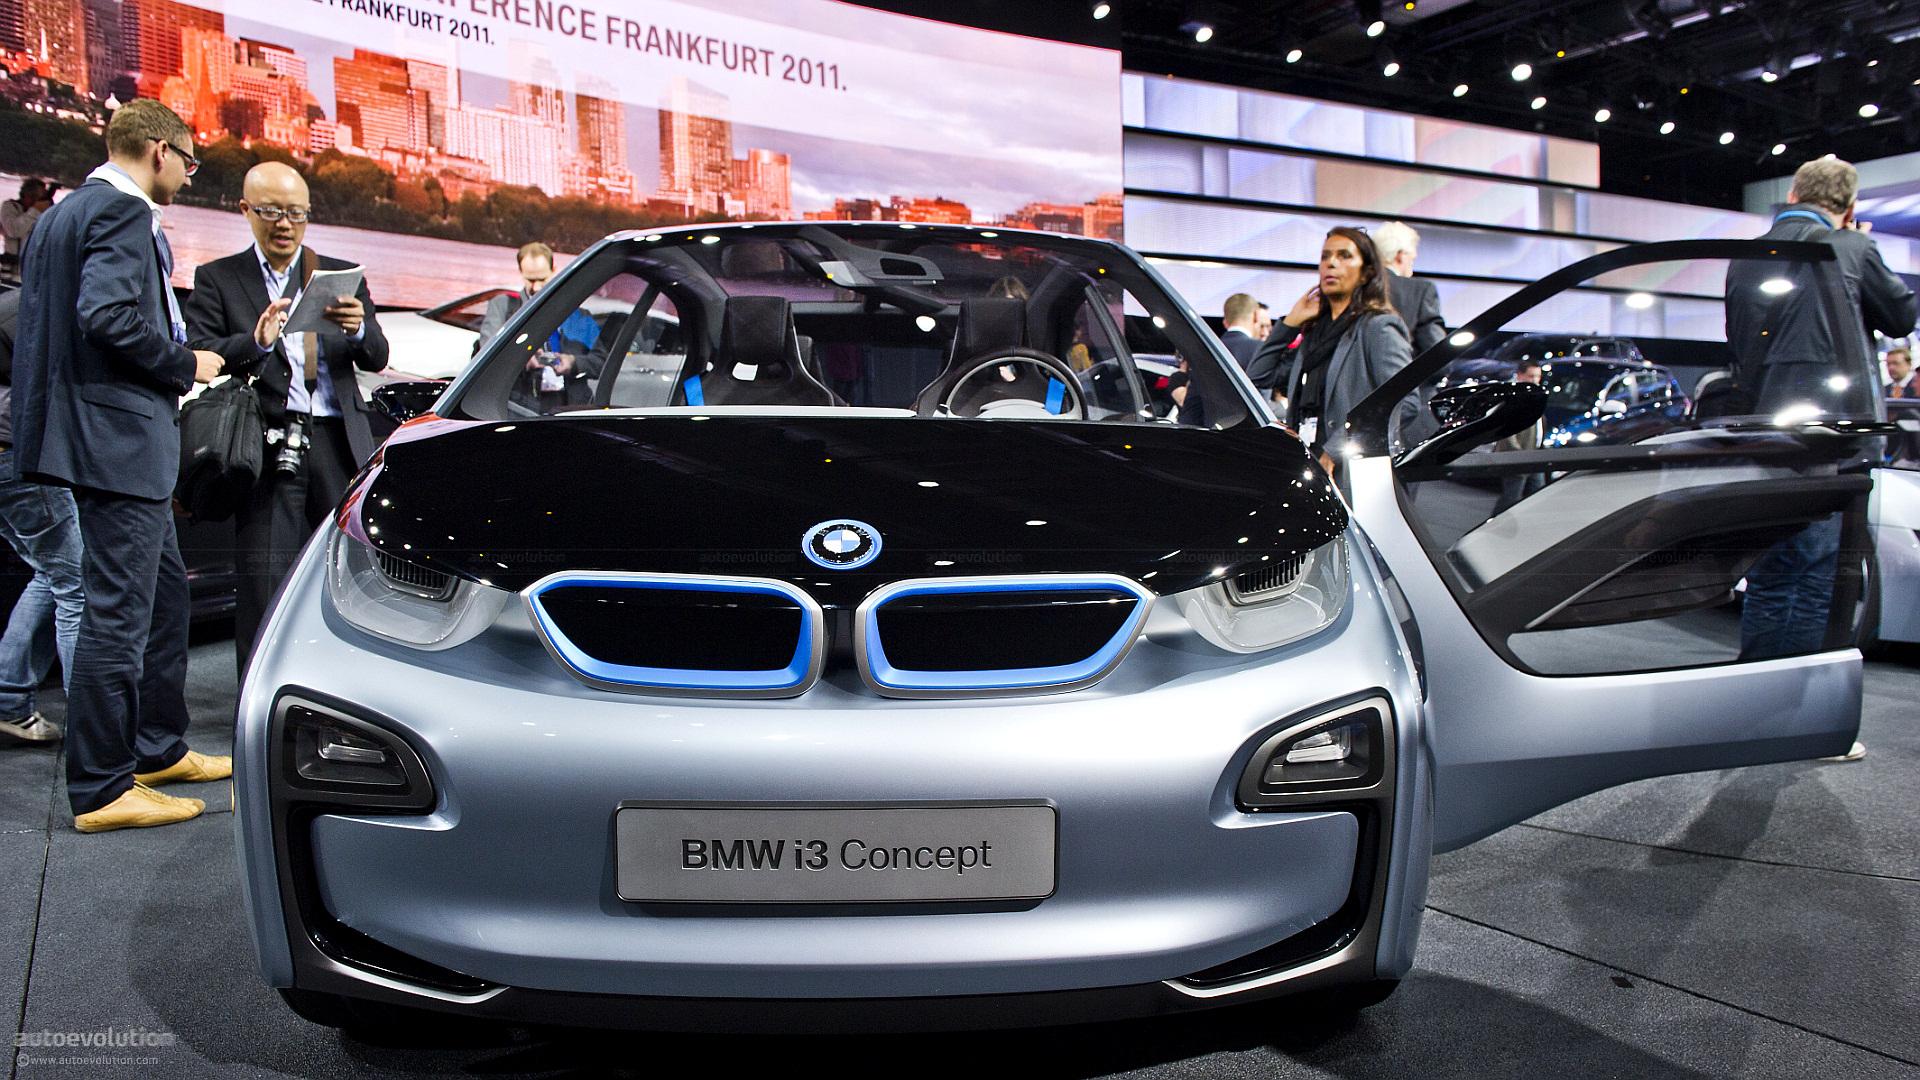 Frankfurt Motor Show to Host Production BMW i3 Unveiling - autoevolution